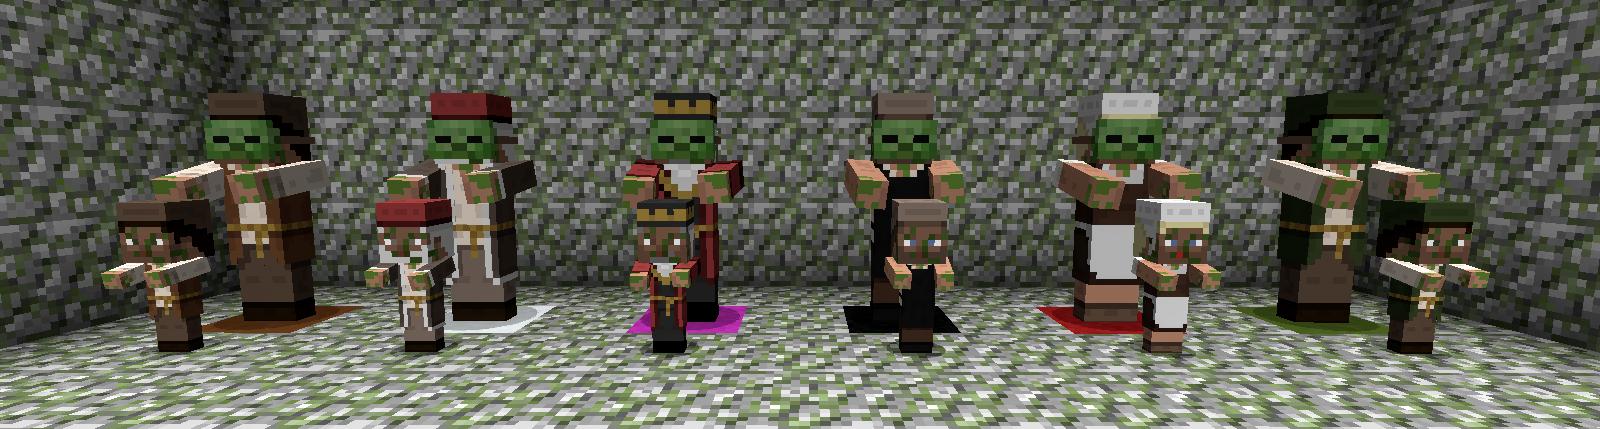 Zombie Villagers